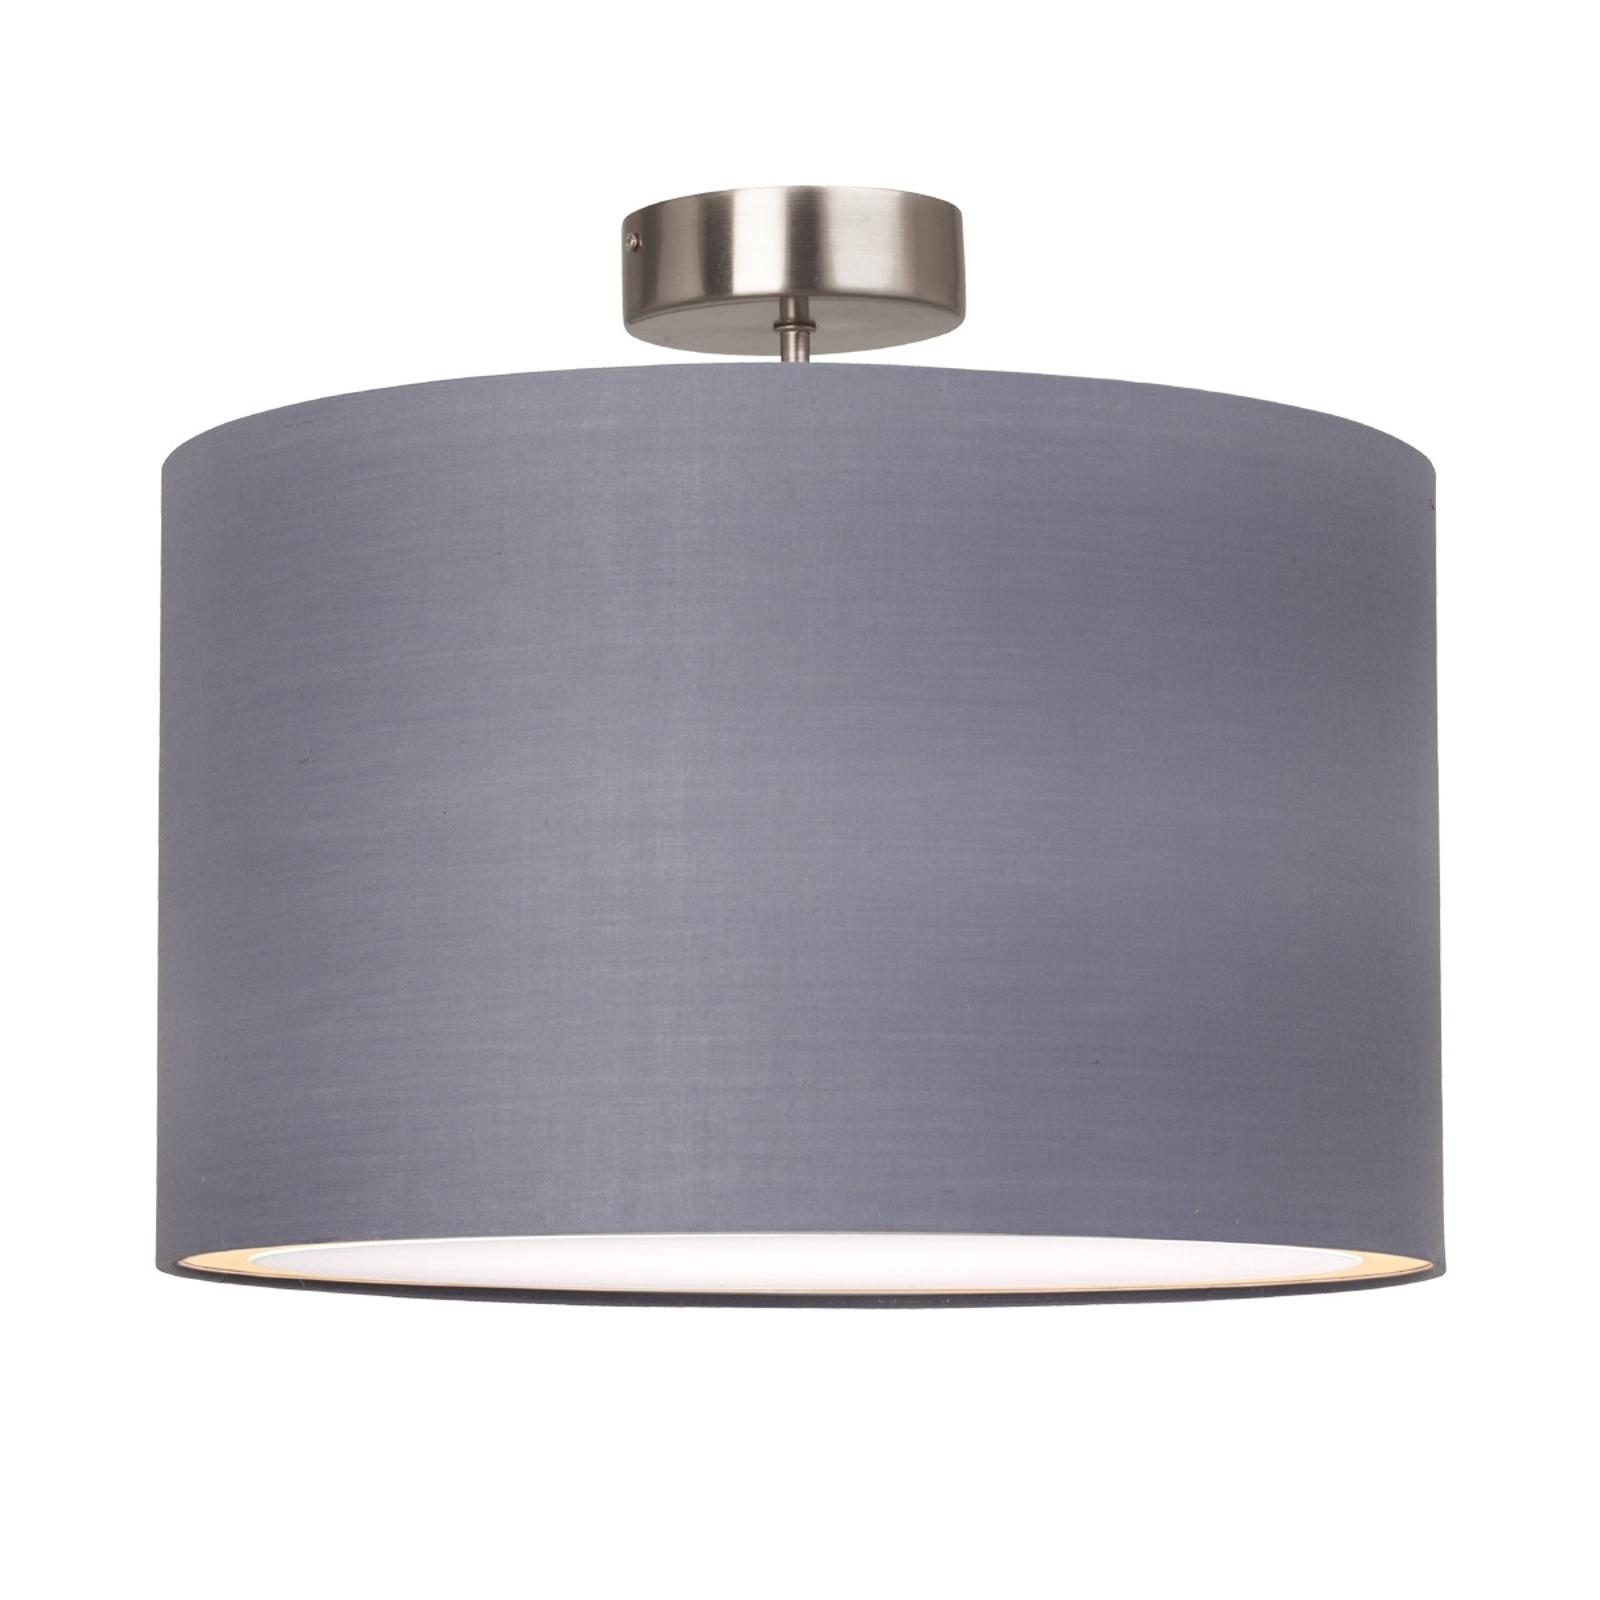 Enkel Clarie loftlampe i grå